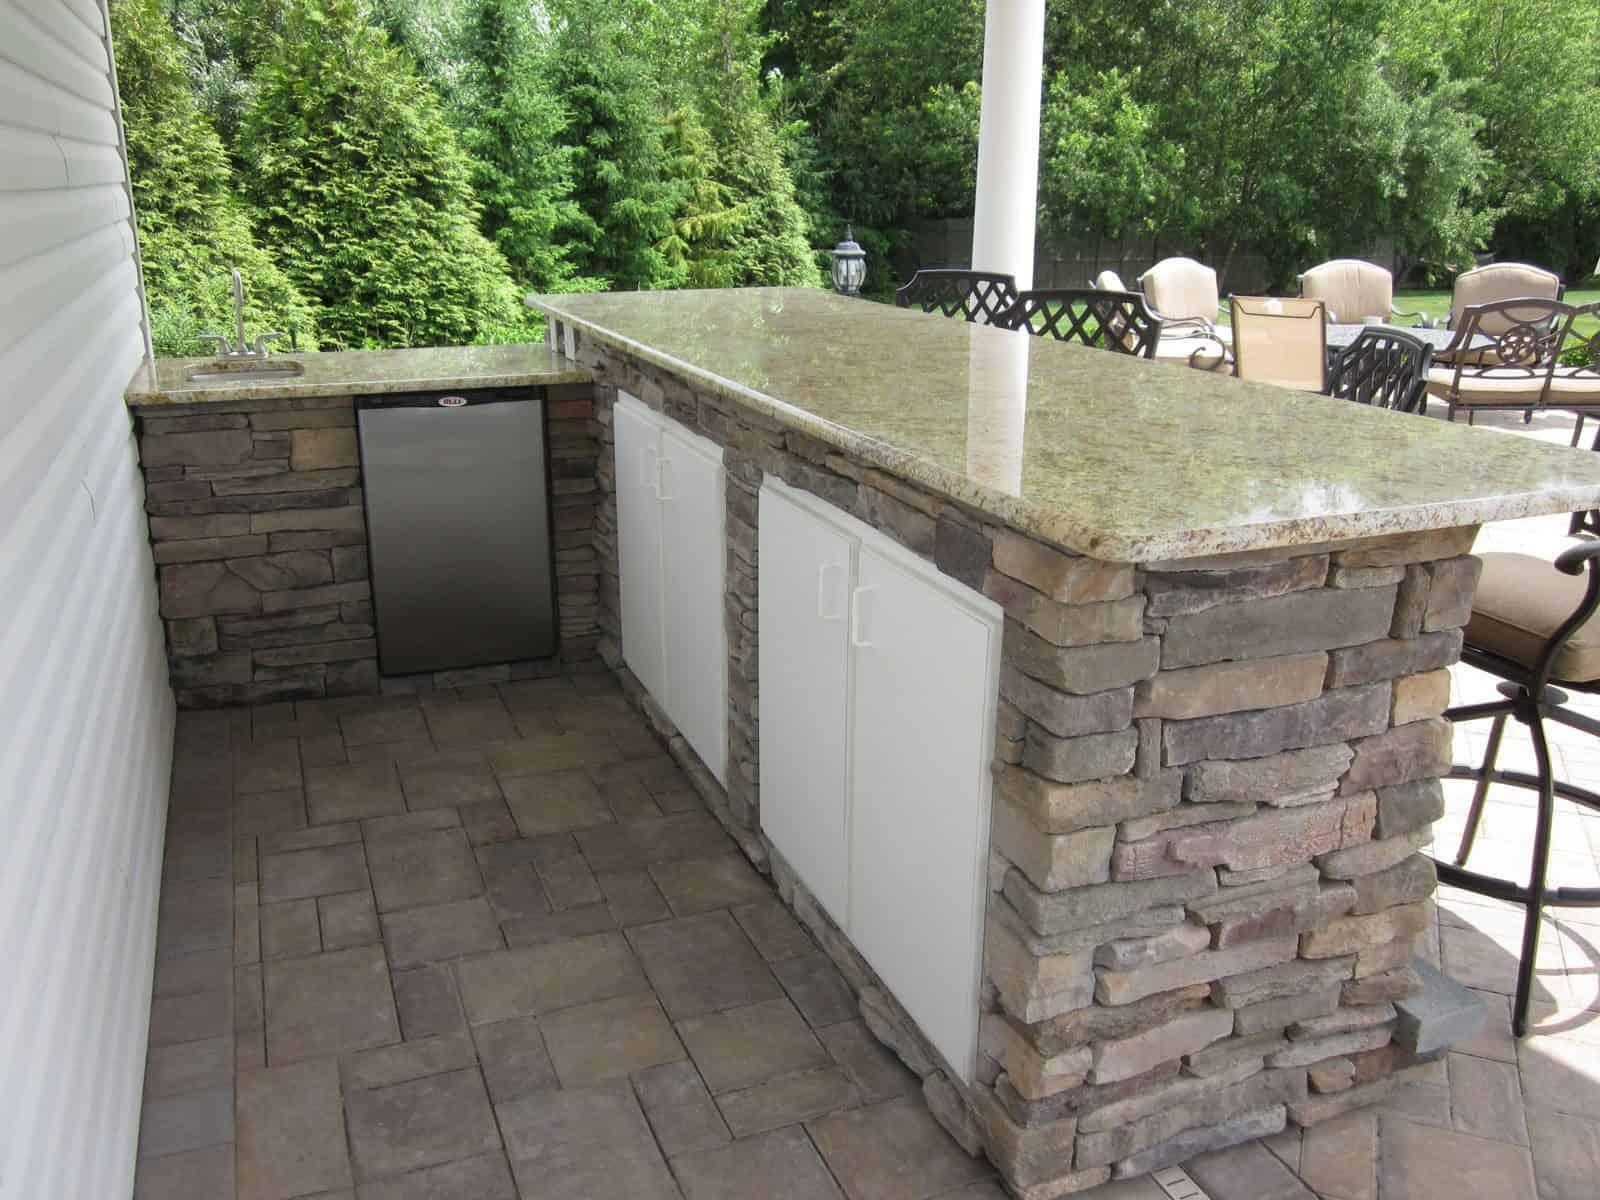 8' Custom Bar veneered with Cultured Stone Ledgestone veneer, Granite counter top, Bull stainless steel sink, custom cabinetry, fridge, and Rockfaced Bluestone foot rest - Dix Hills, Long Island NY